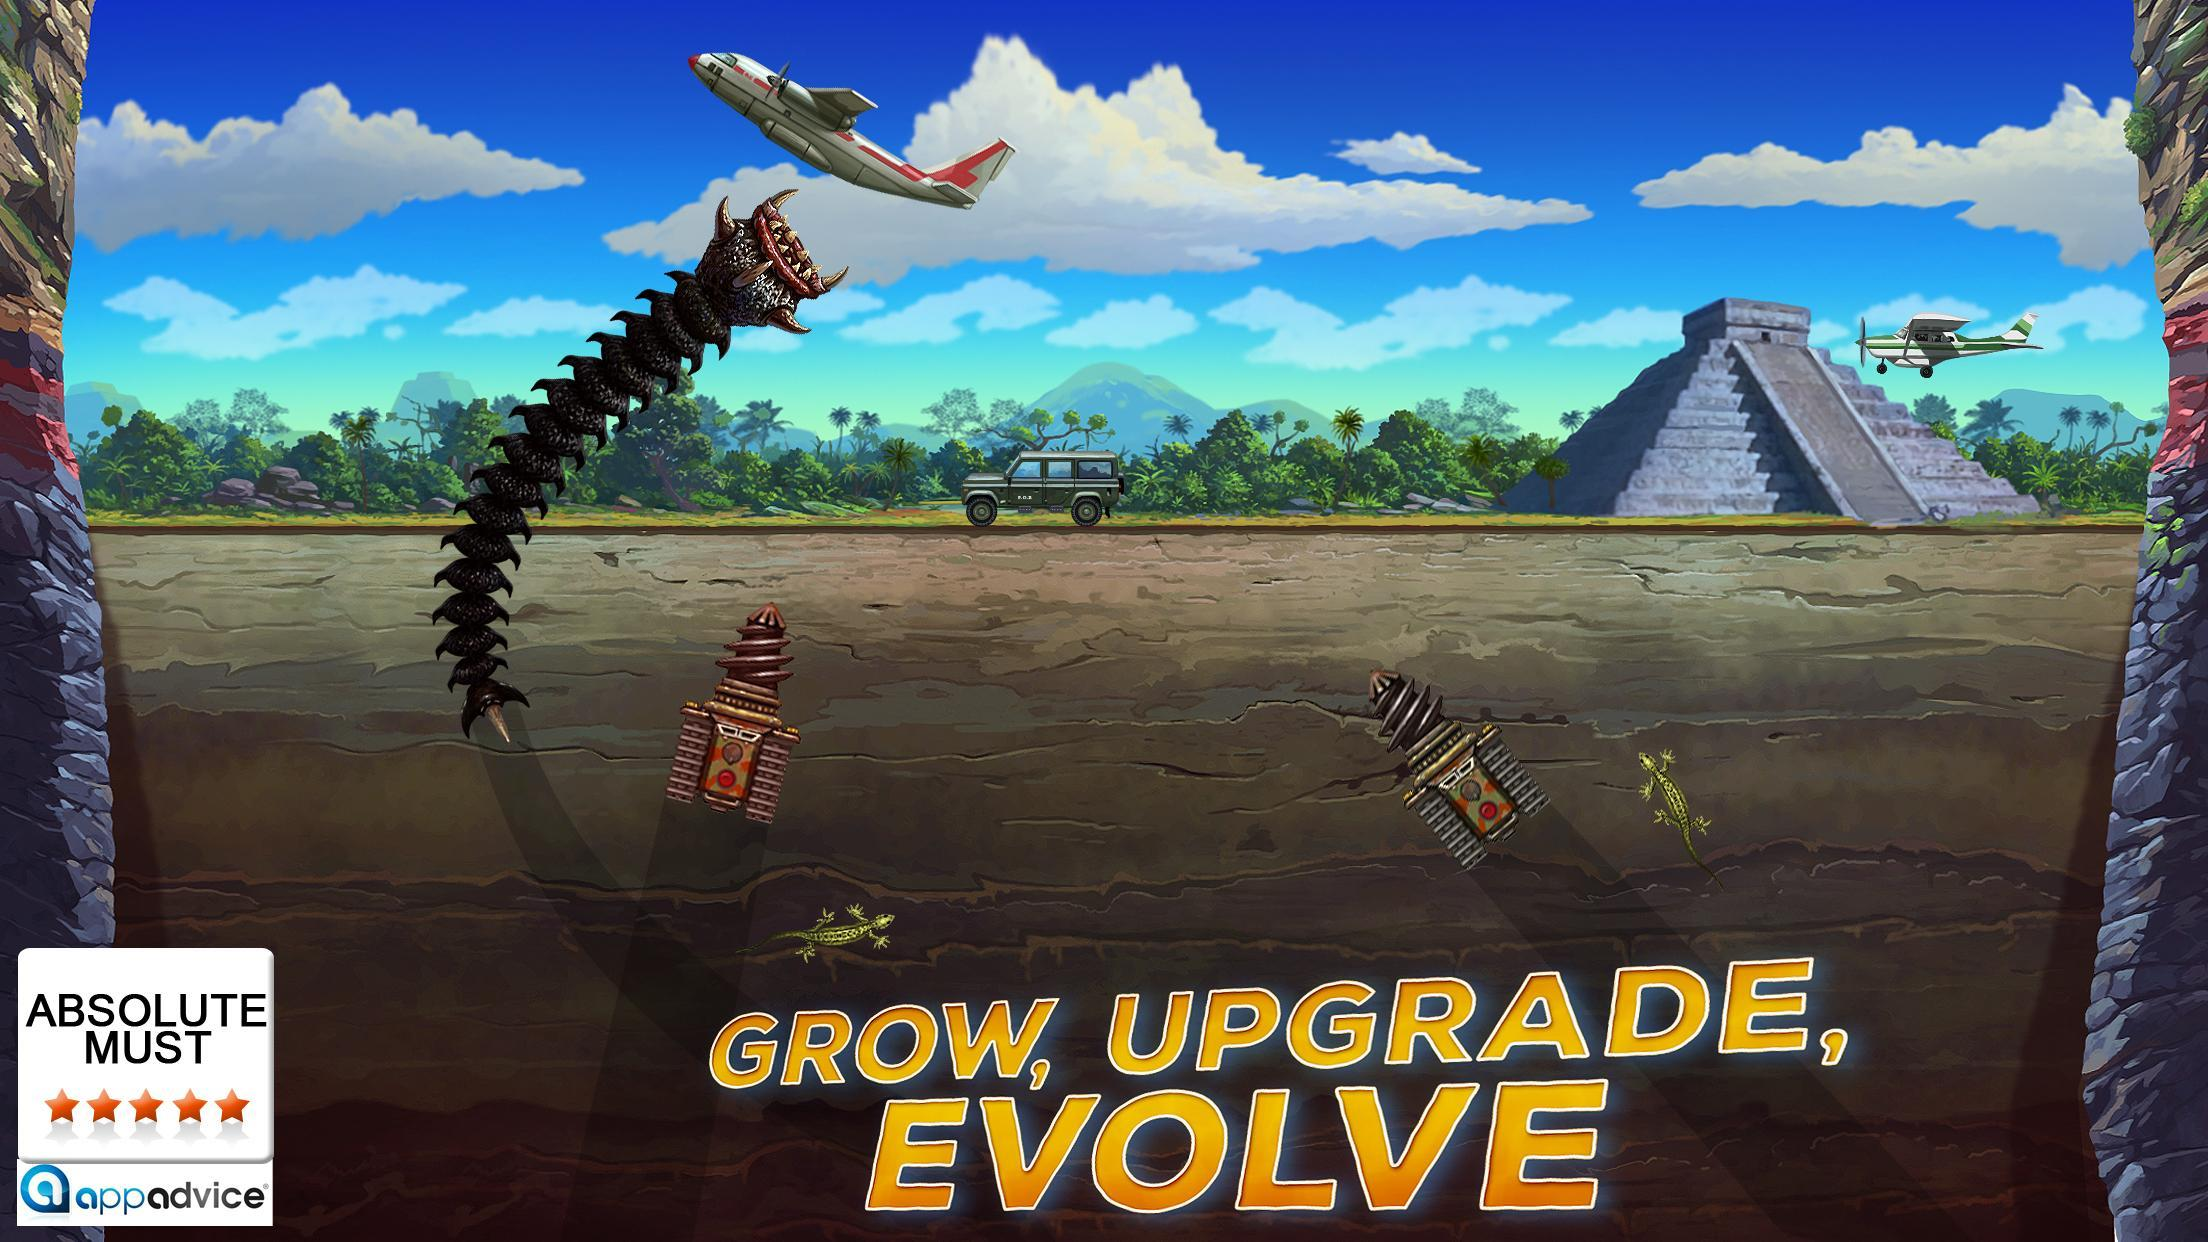 Death worm 2 game full screen casino royale ondertitels axxo